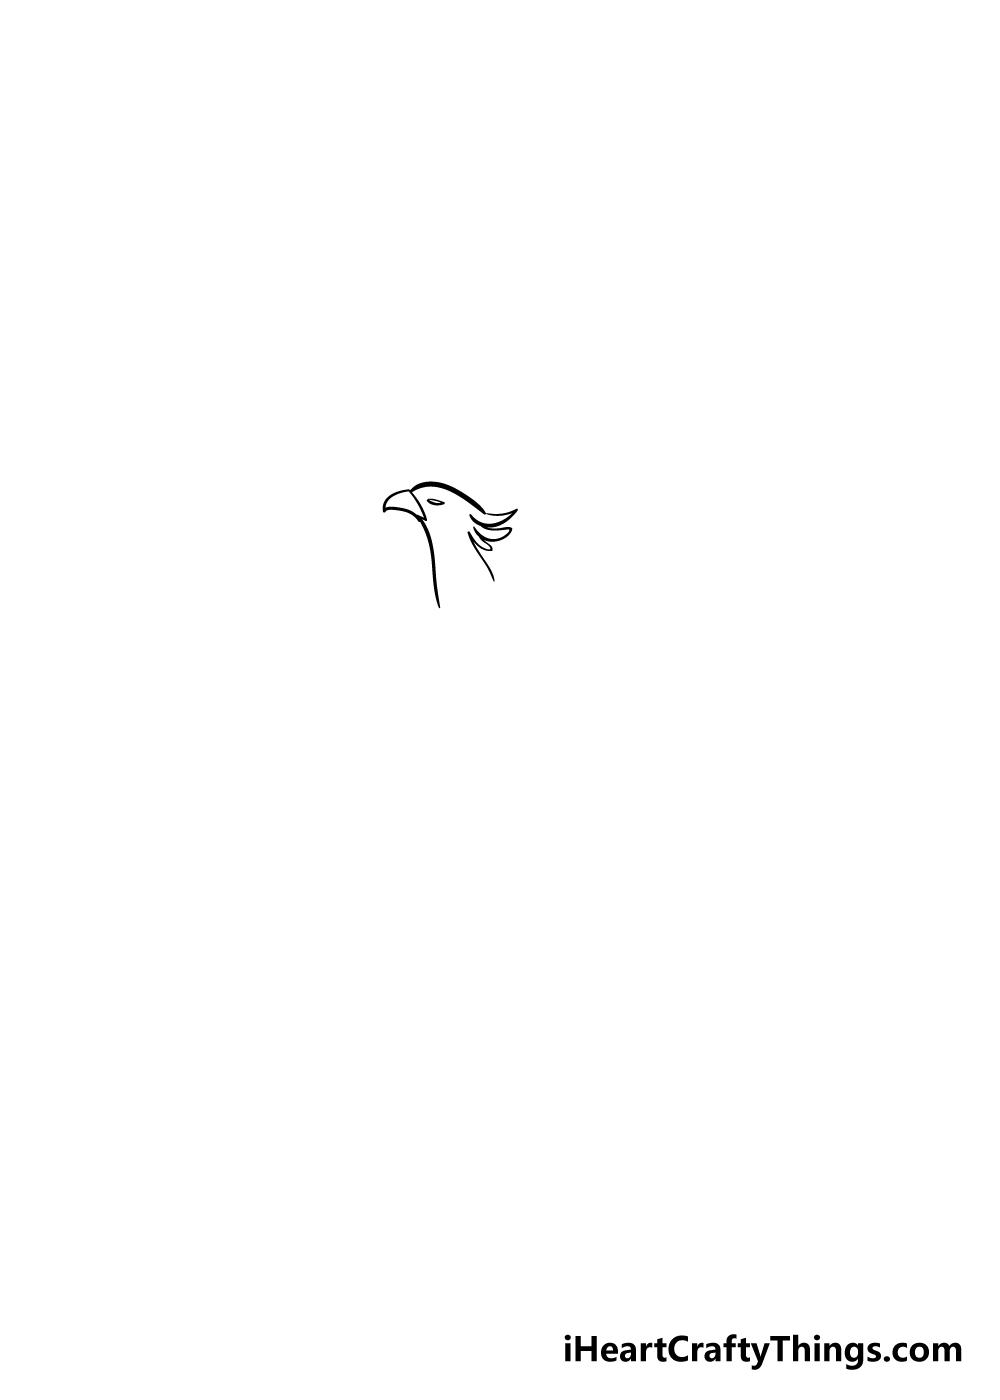 phoenix drawing step 1